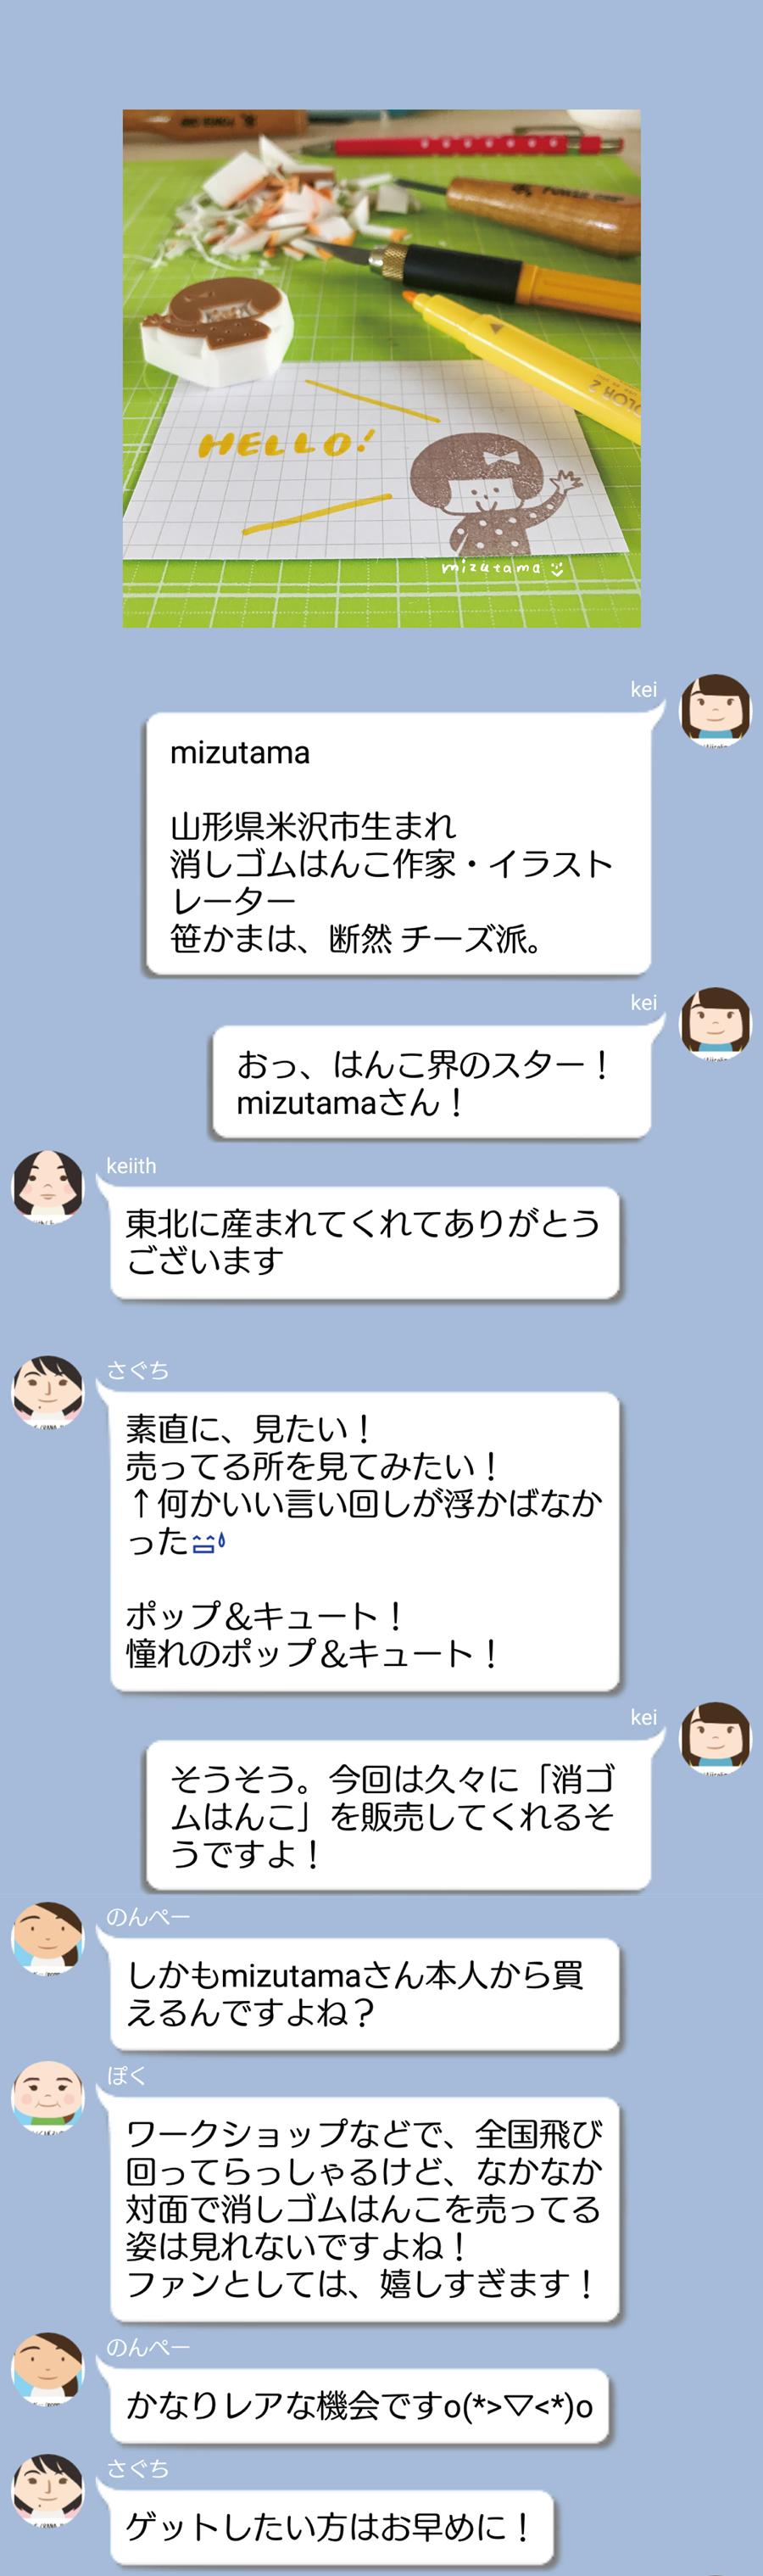 4mizutama_00.png